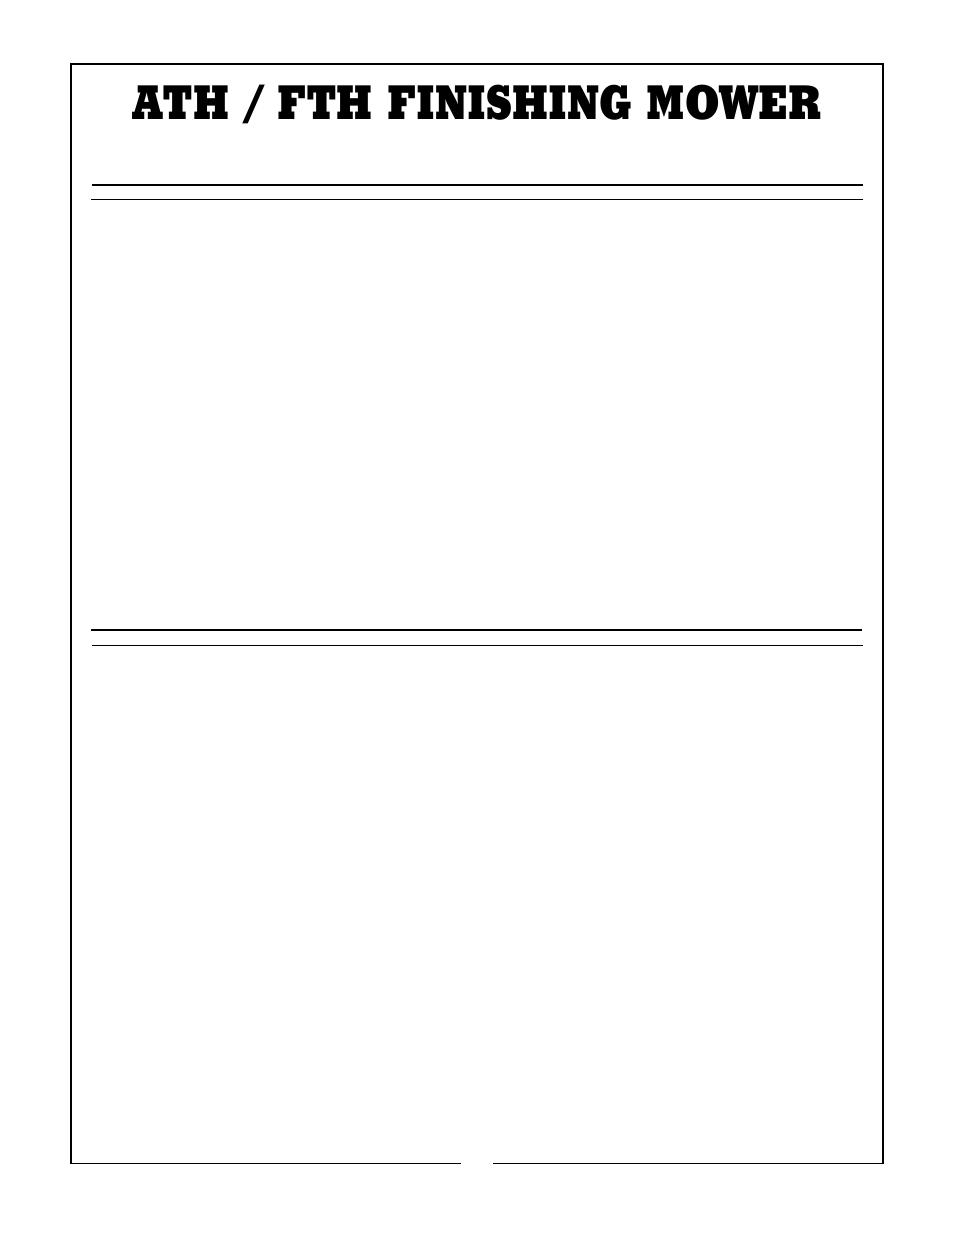 Bush Hog FTH 600 User Manual | Page 3 / 20 | Original mode